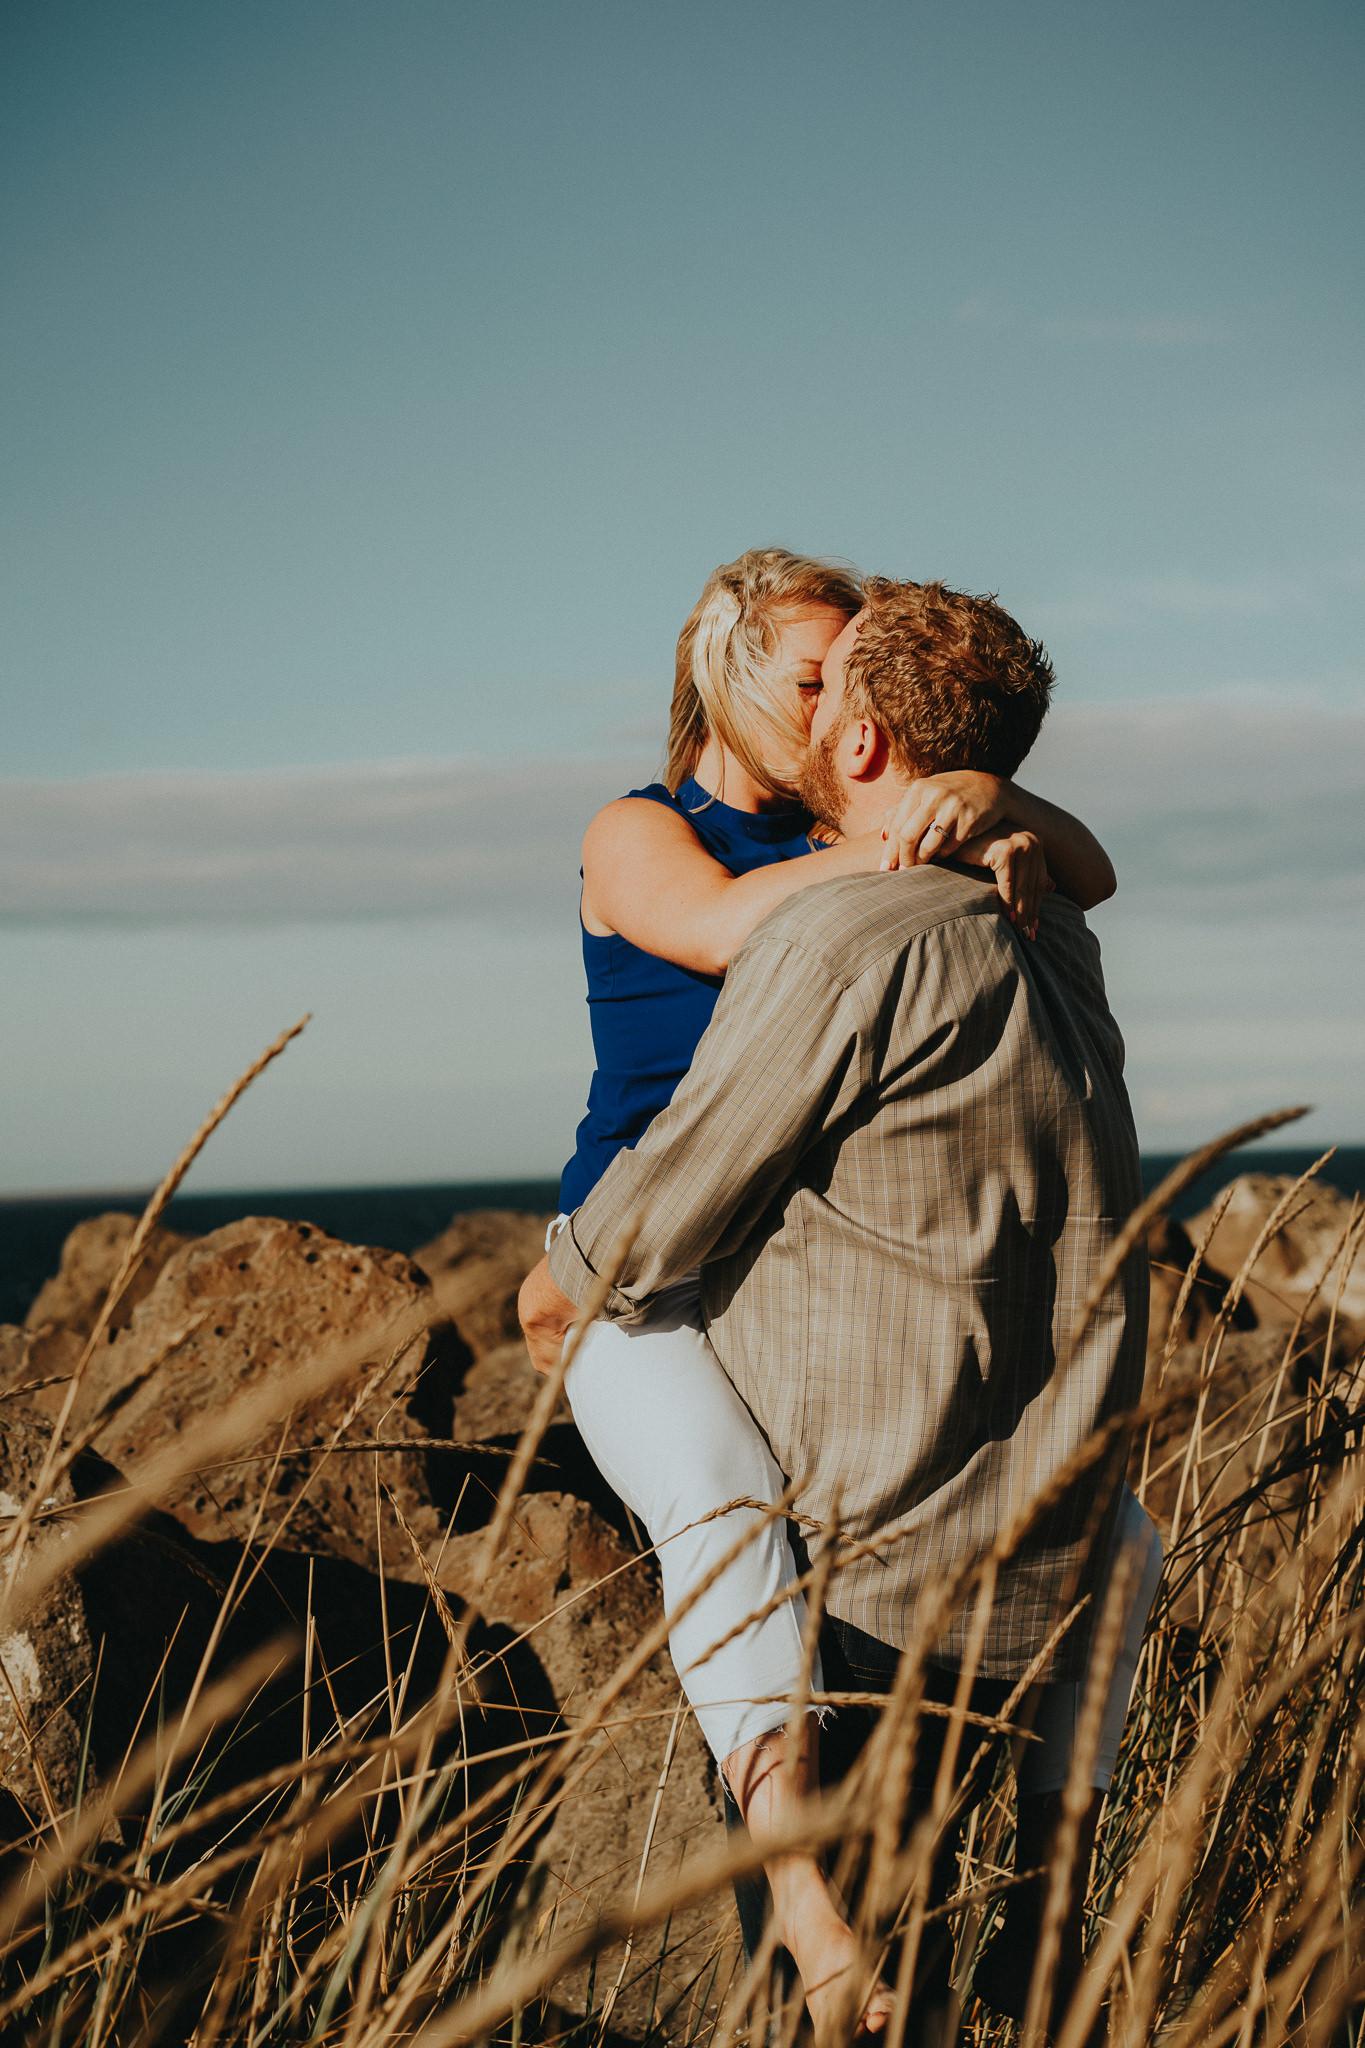 Couple-pose-Engagement-Intimate-Photographer